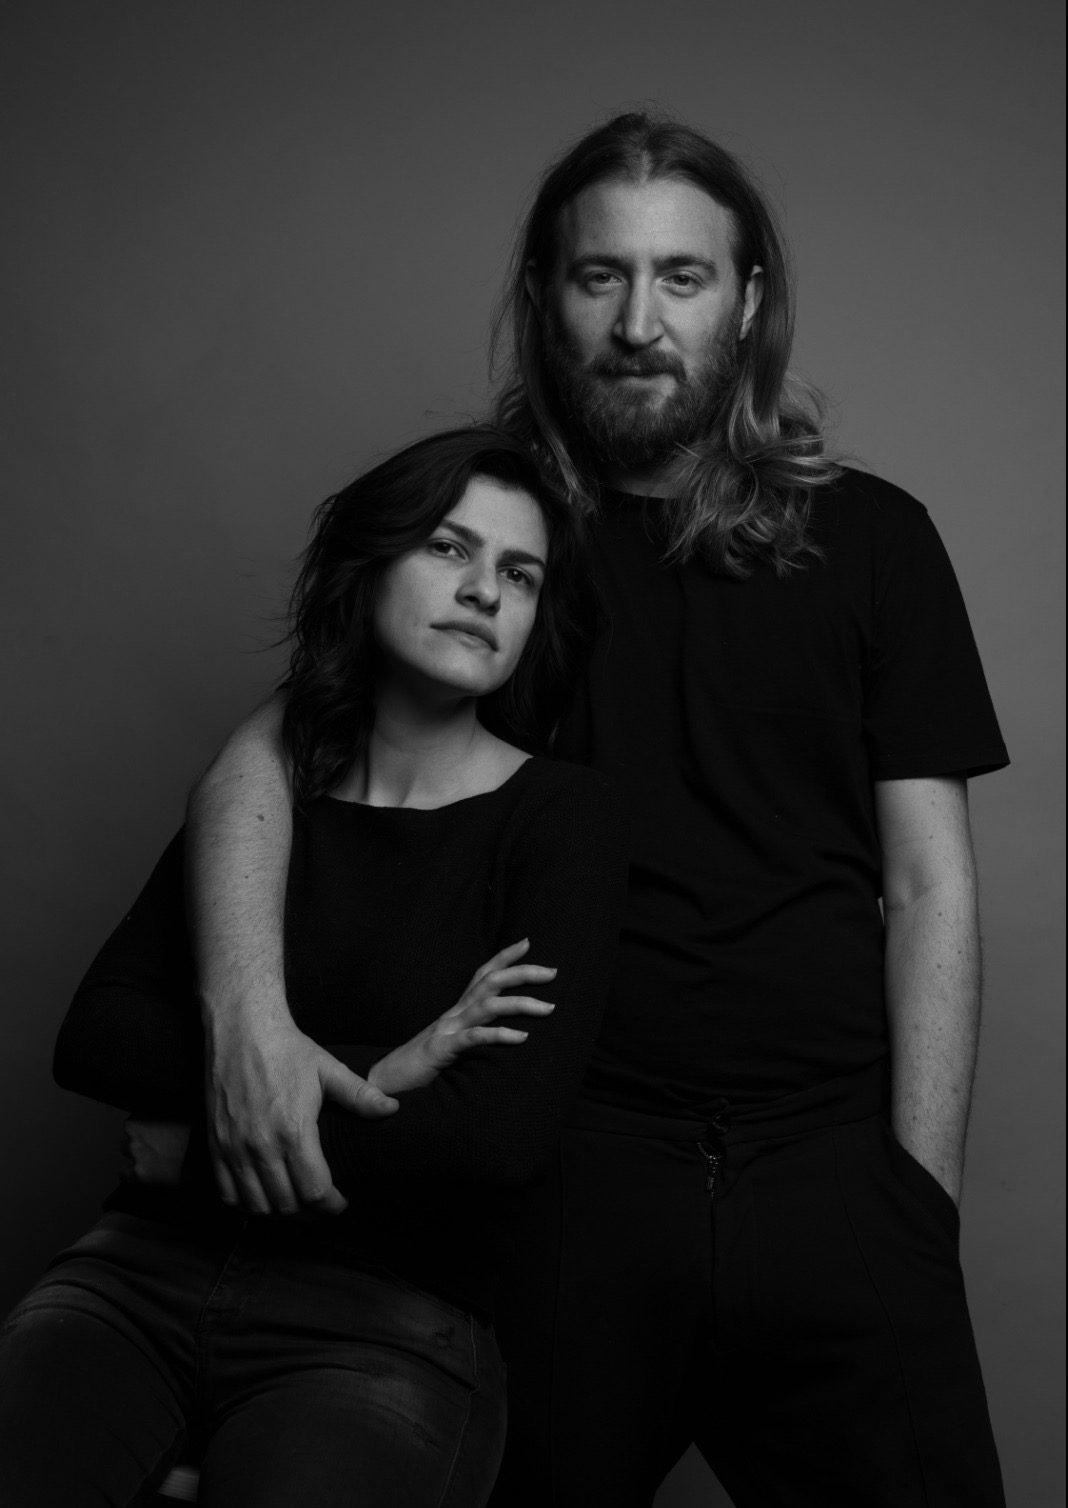 abio e Stefania Biancamaria22 bianco e nero parrucchieri milano 2